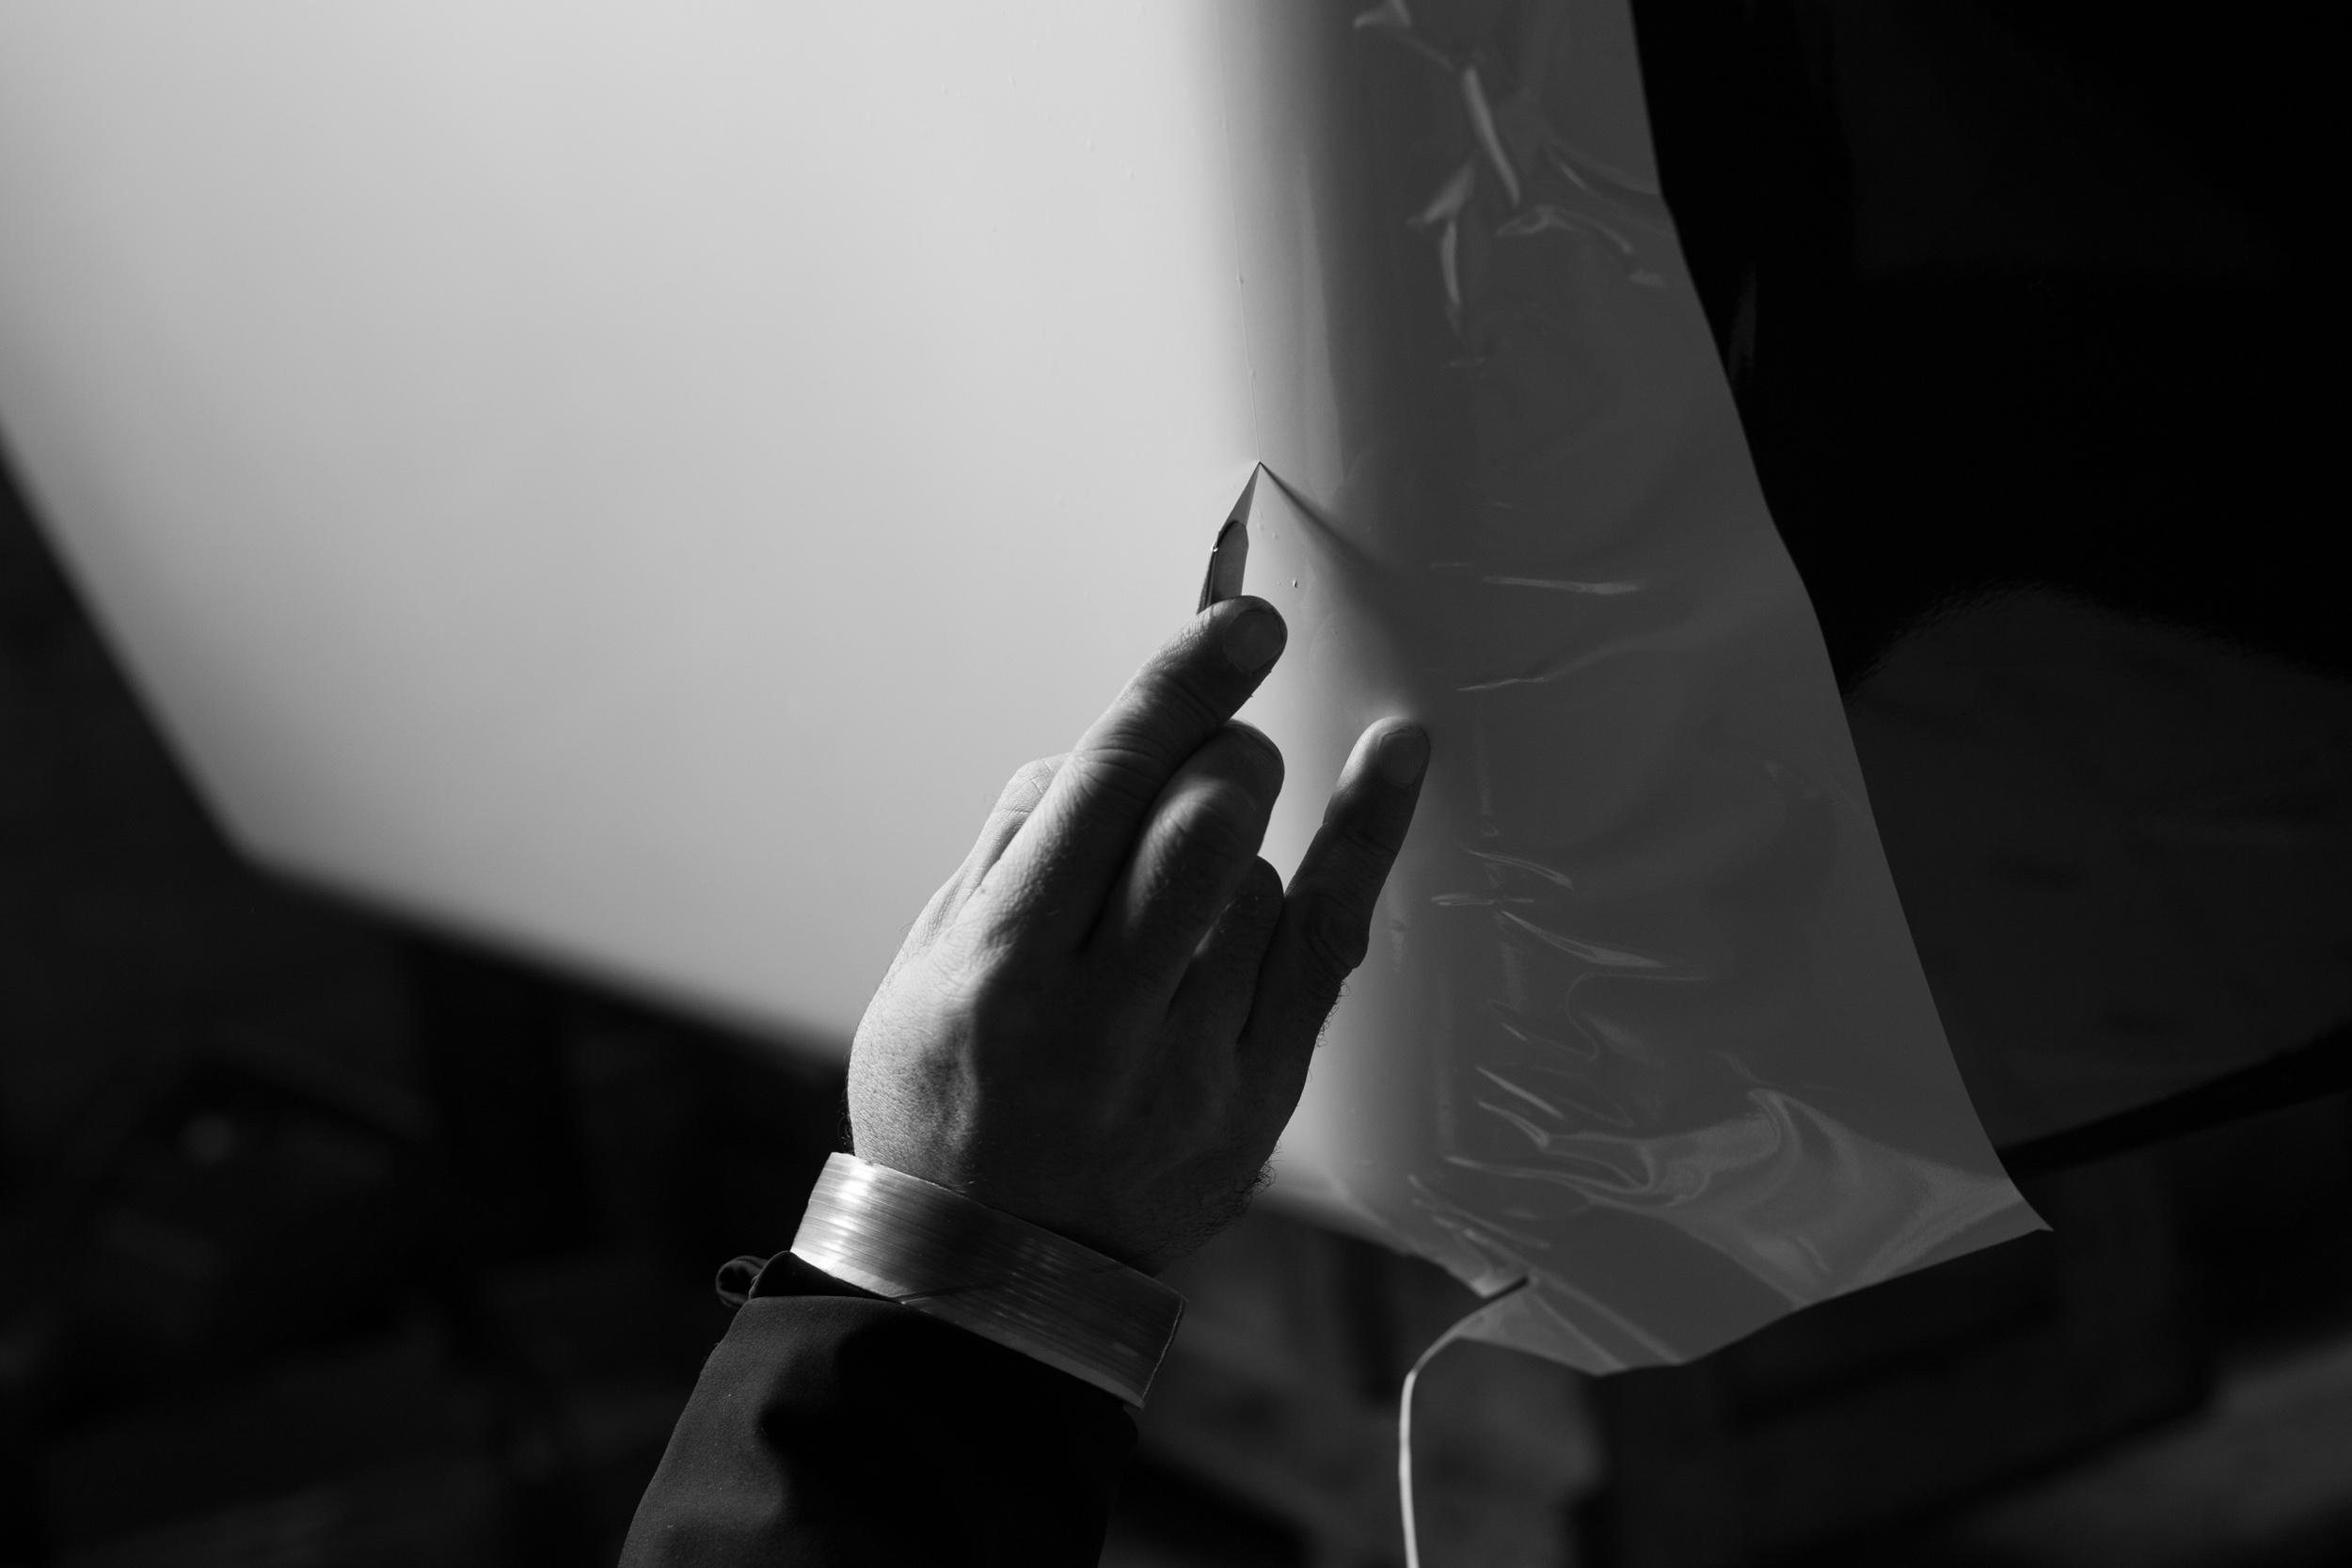 11SELECTION_MAKING_OF-GRANDBORAMA-©AUGUSTIN_LOSSERAND-BD